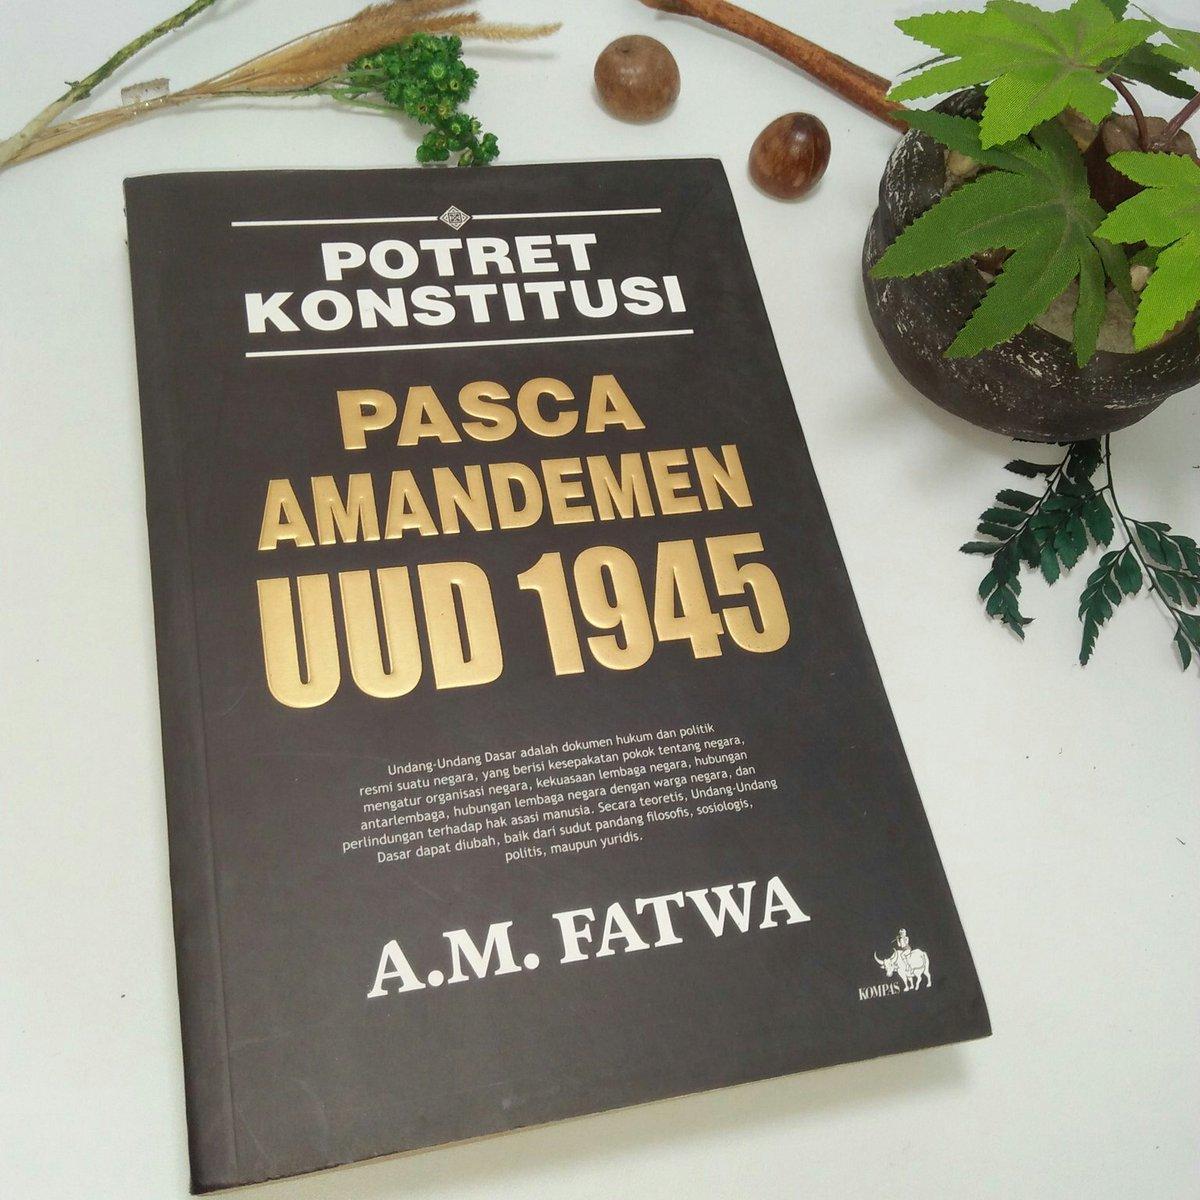 Buku Lawas > Potret Konstitusi Pasca Amandemen UUD 1945.  Karya A.M. Fatwa.   Tahun 2009. 327 Halaman.  Harga 85.000. Minat?   Order: ✓DM or Klik WA http://bit.ly/warungsejarahRIpic.twitter.com/lhGilmw2gg